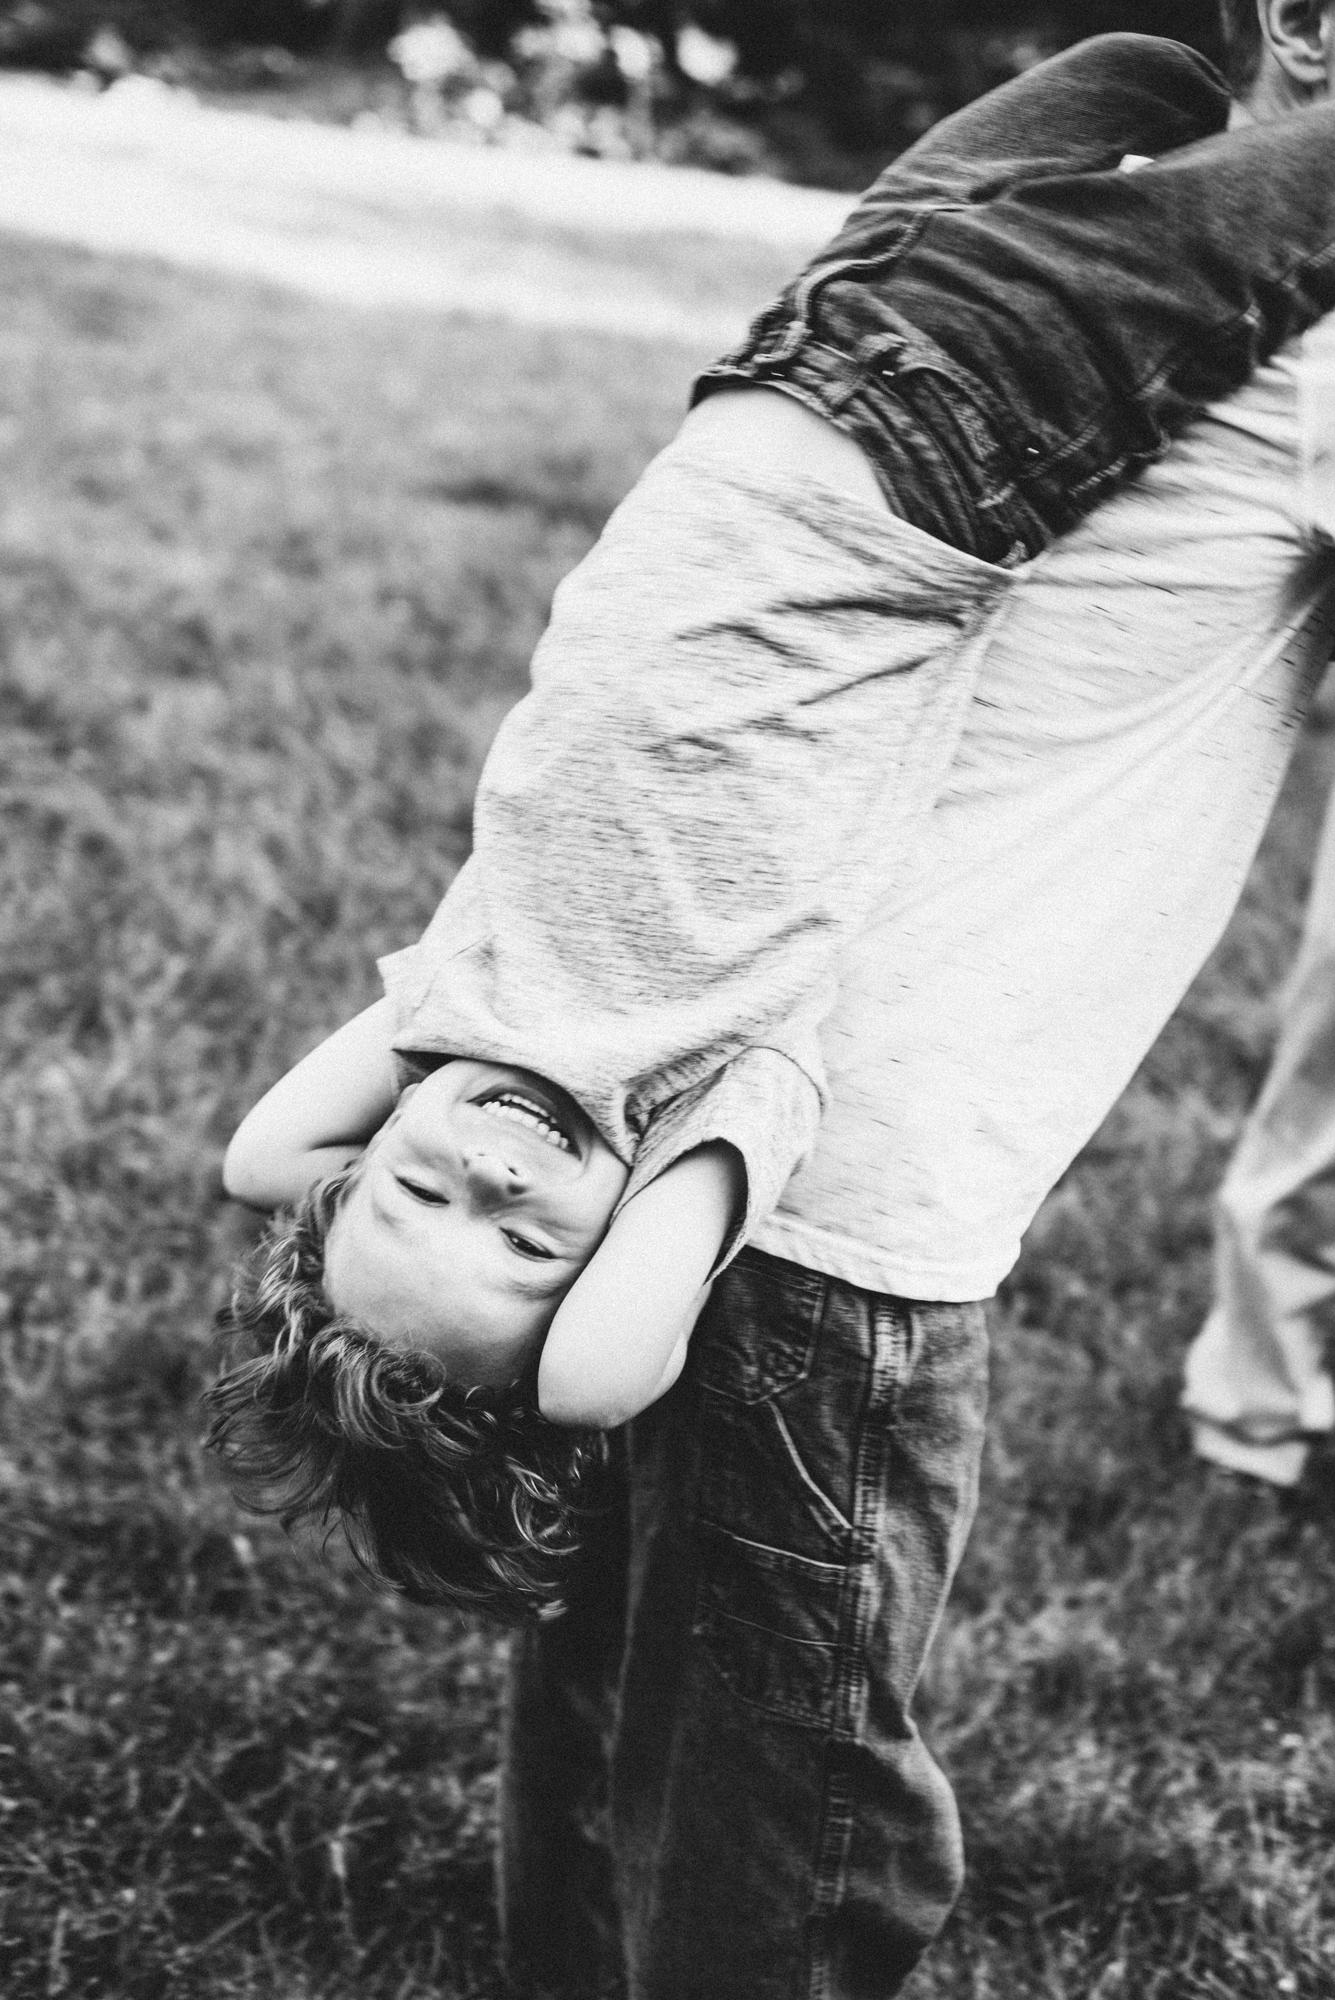 Flippen_Family_Photo_Shoot_Lifestyle_Blandy_Farm_Winchester_White_Sails_Photography_Creative_89.JPG